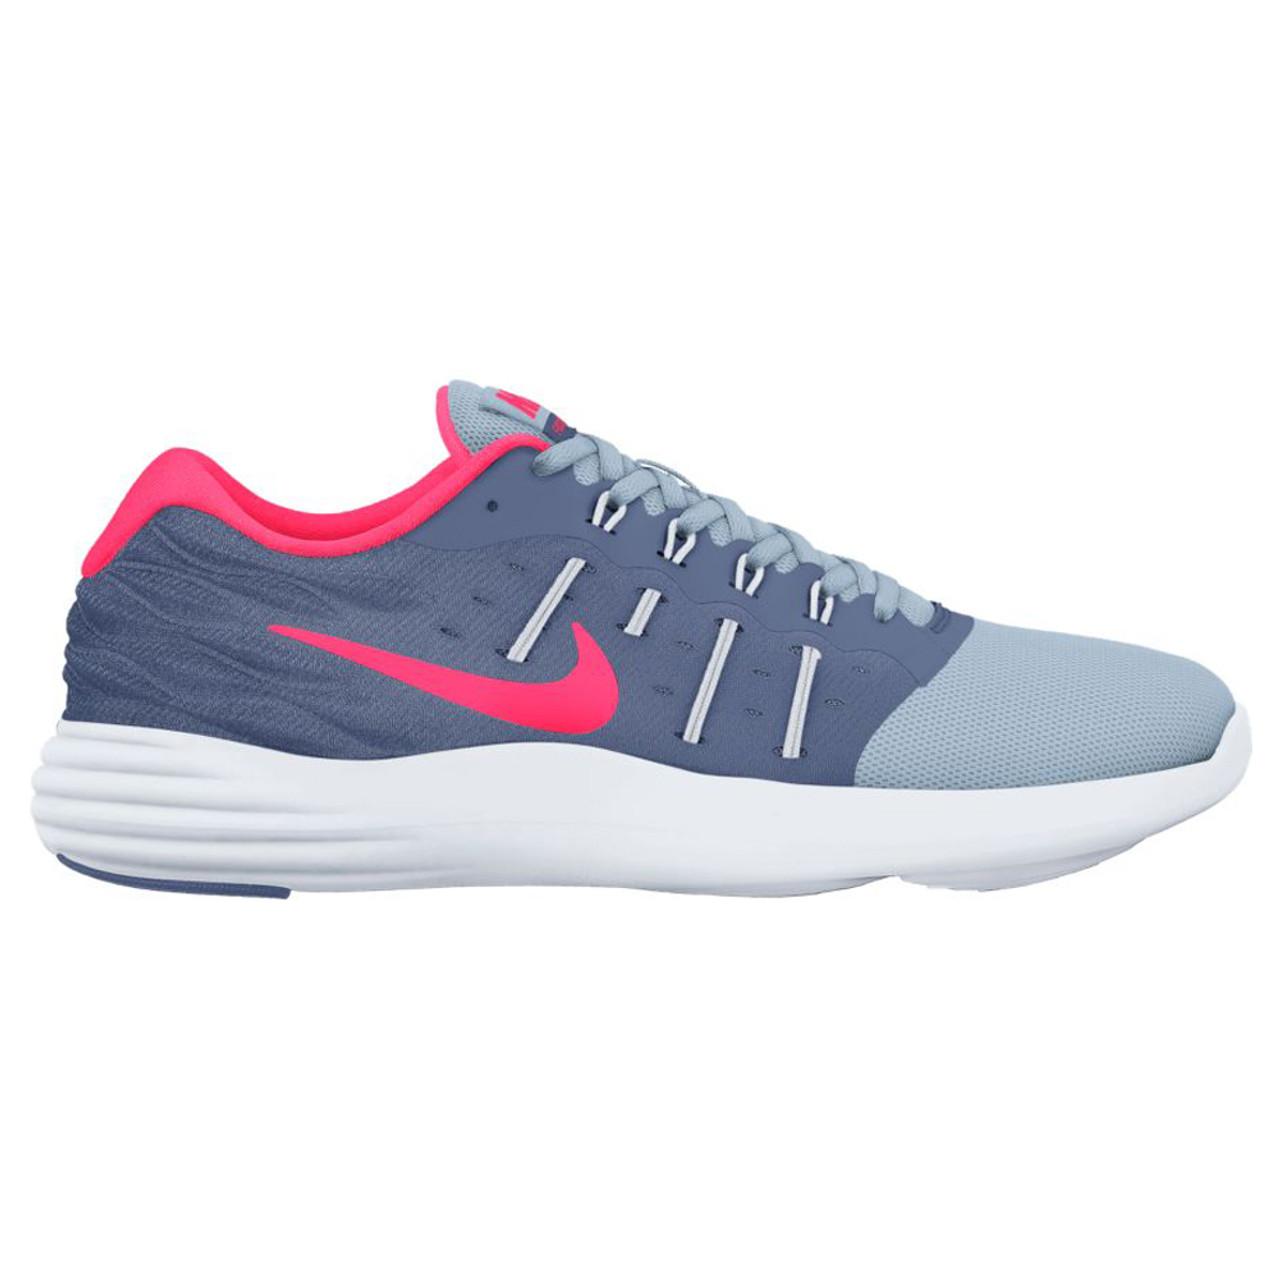 c5e6ee024232 ... good nike womens lunarstelos running shoe blue pink shop now shoolu  1782e 3540b